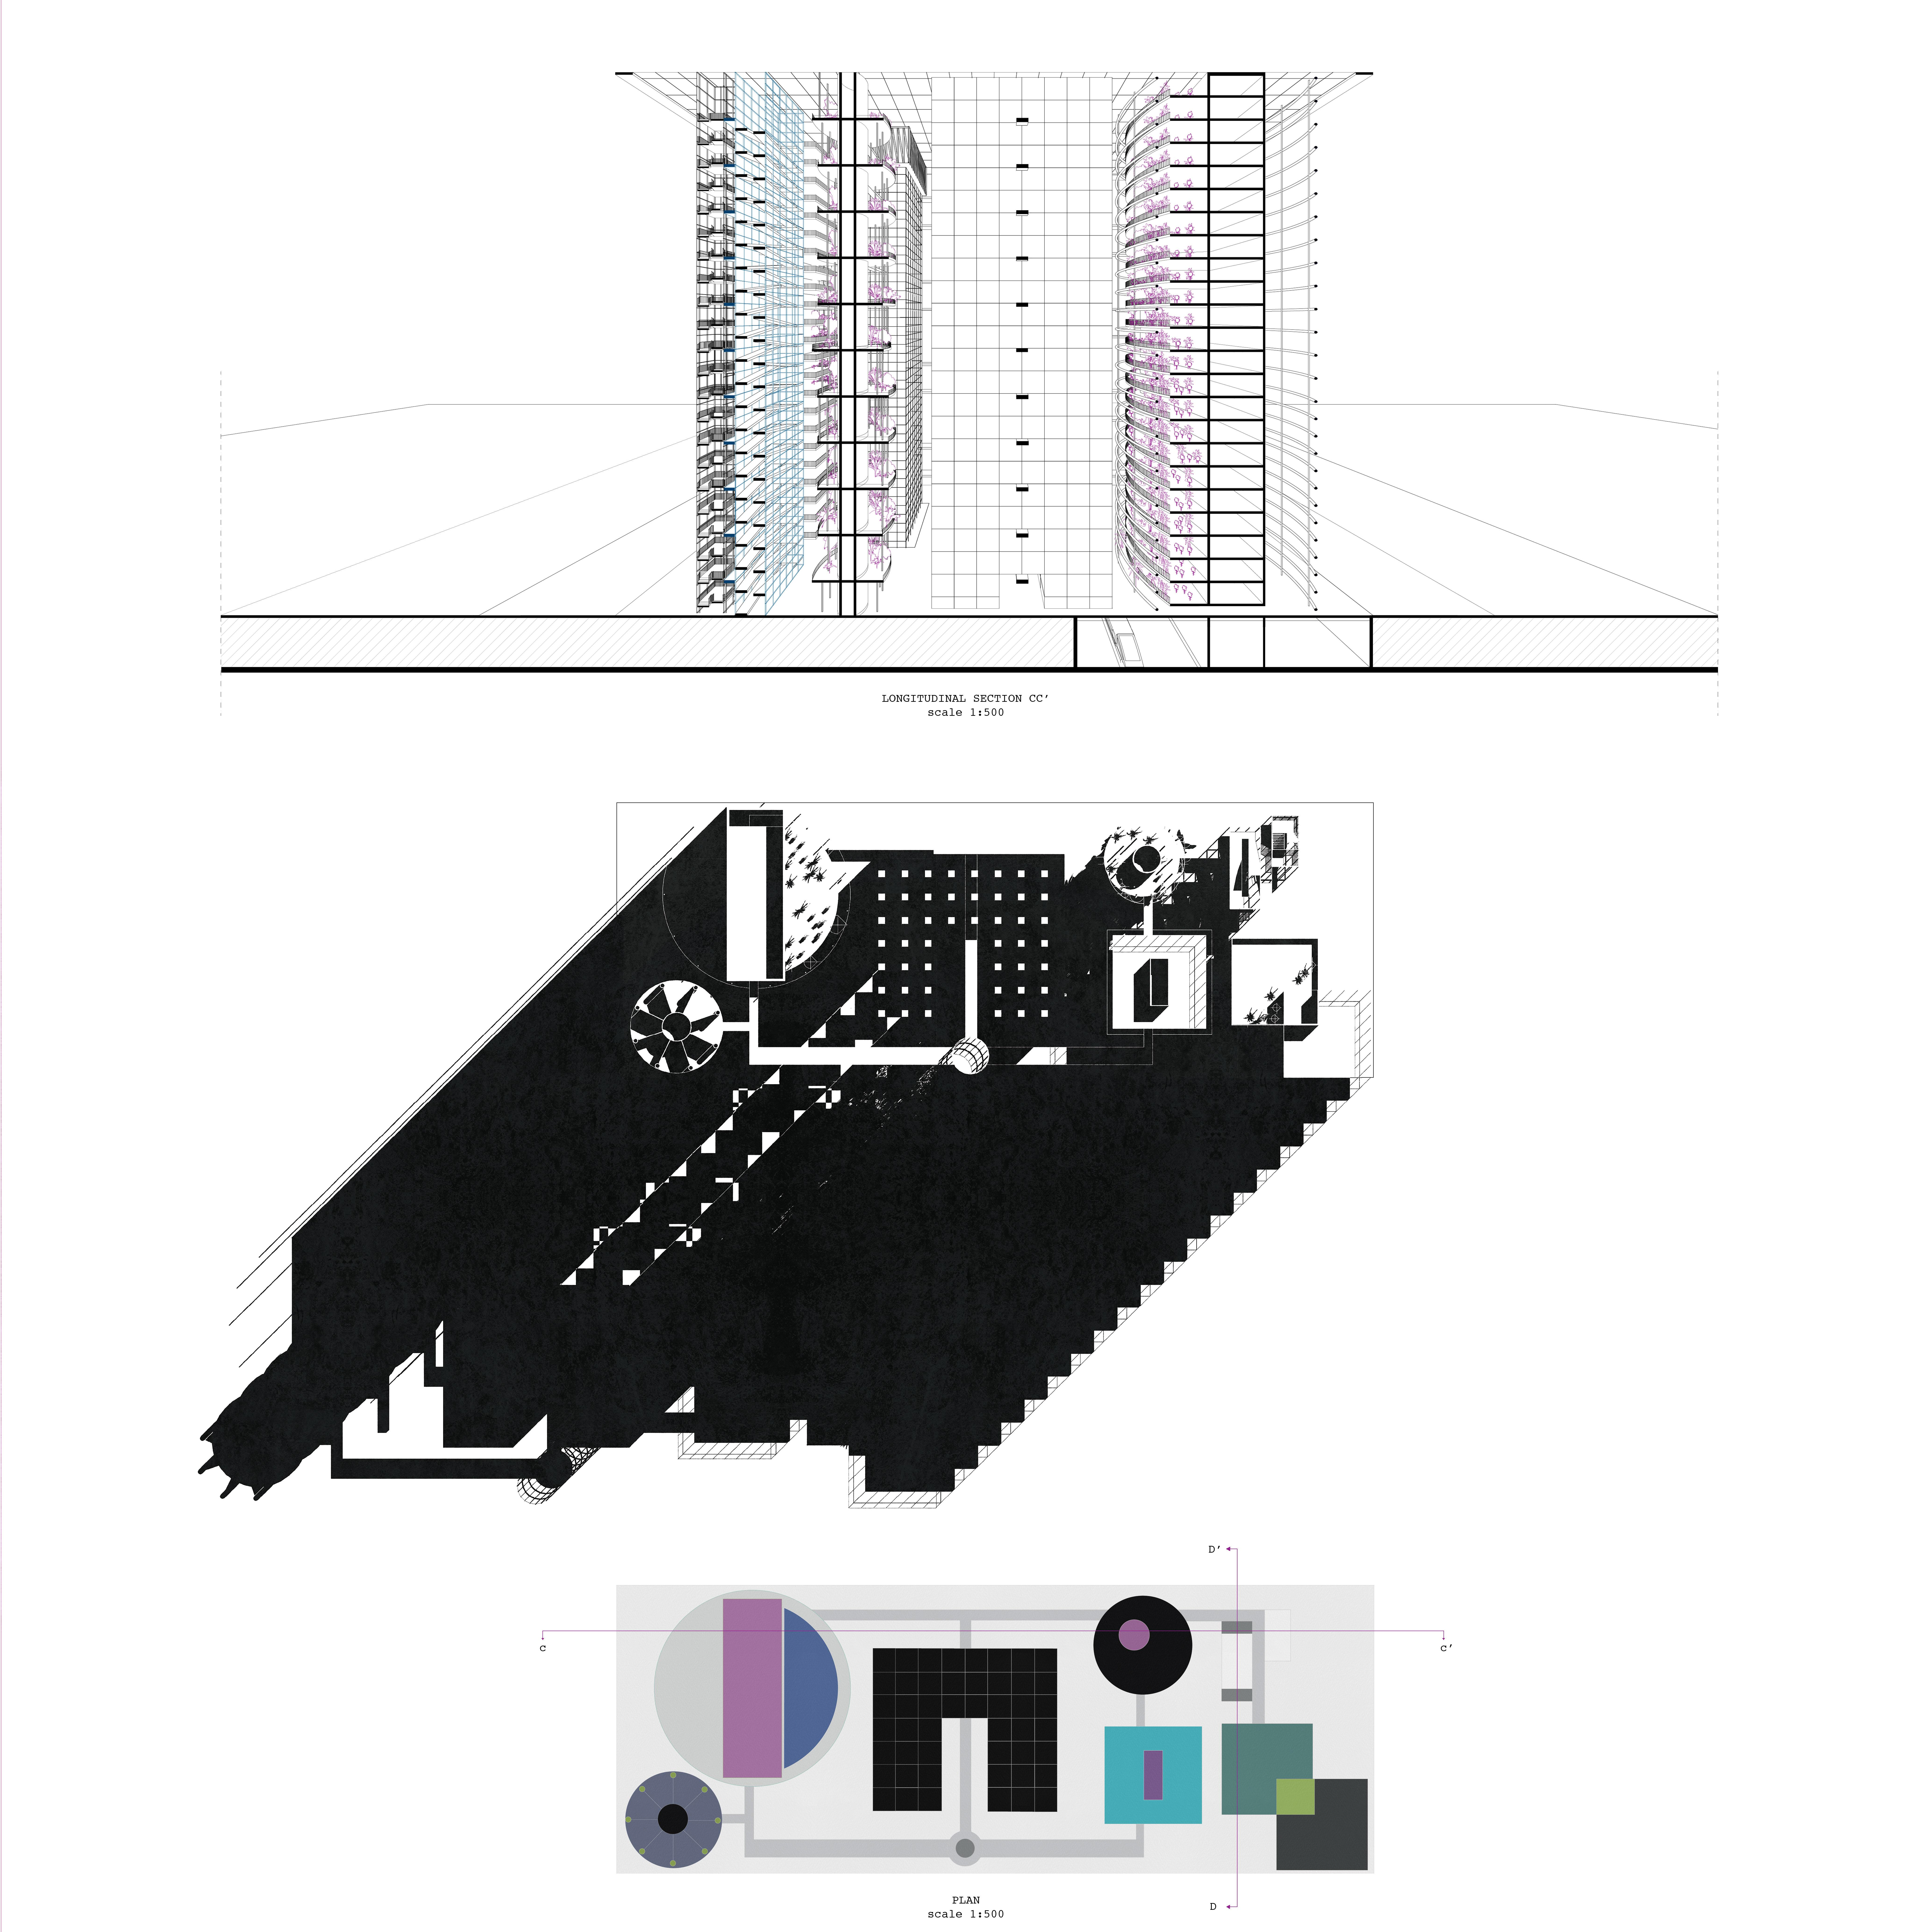 6 Greco Breda plan section